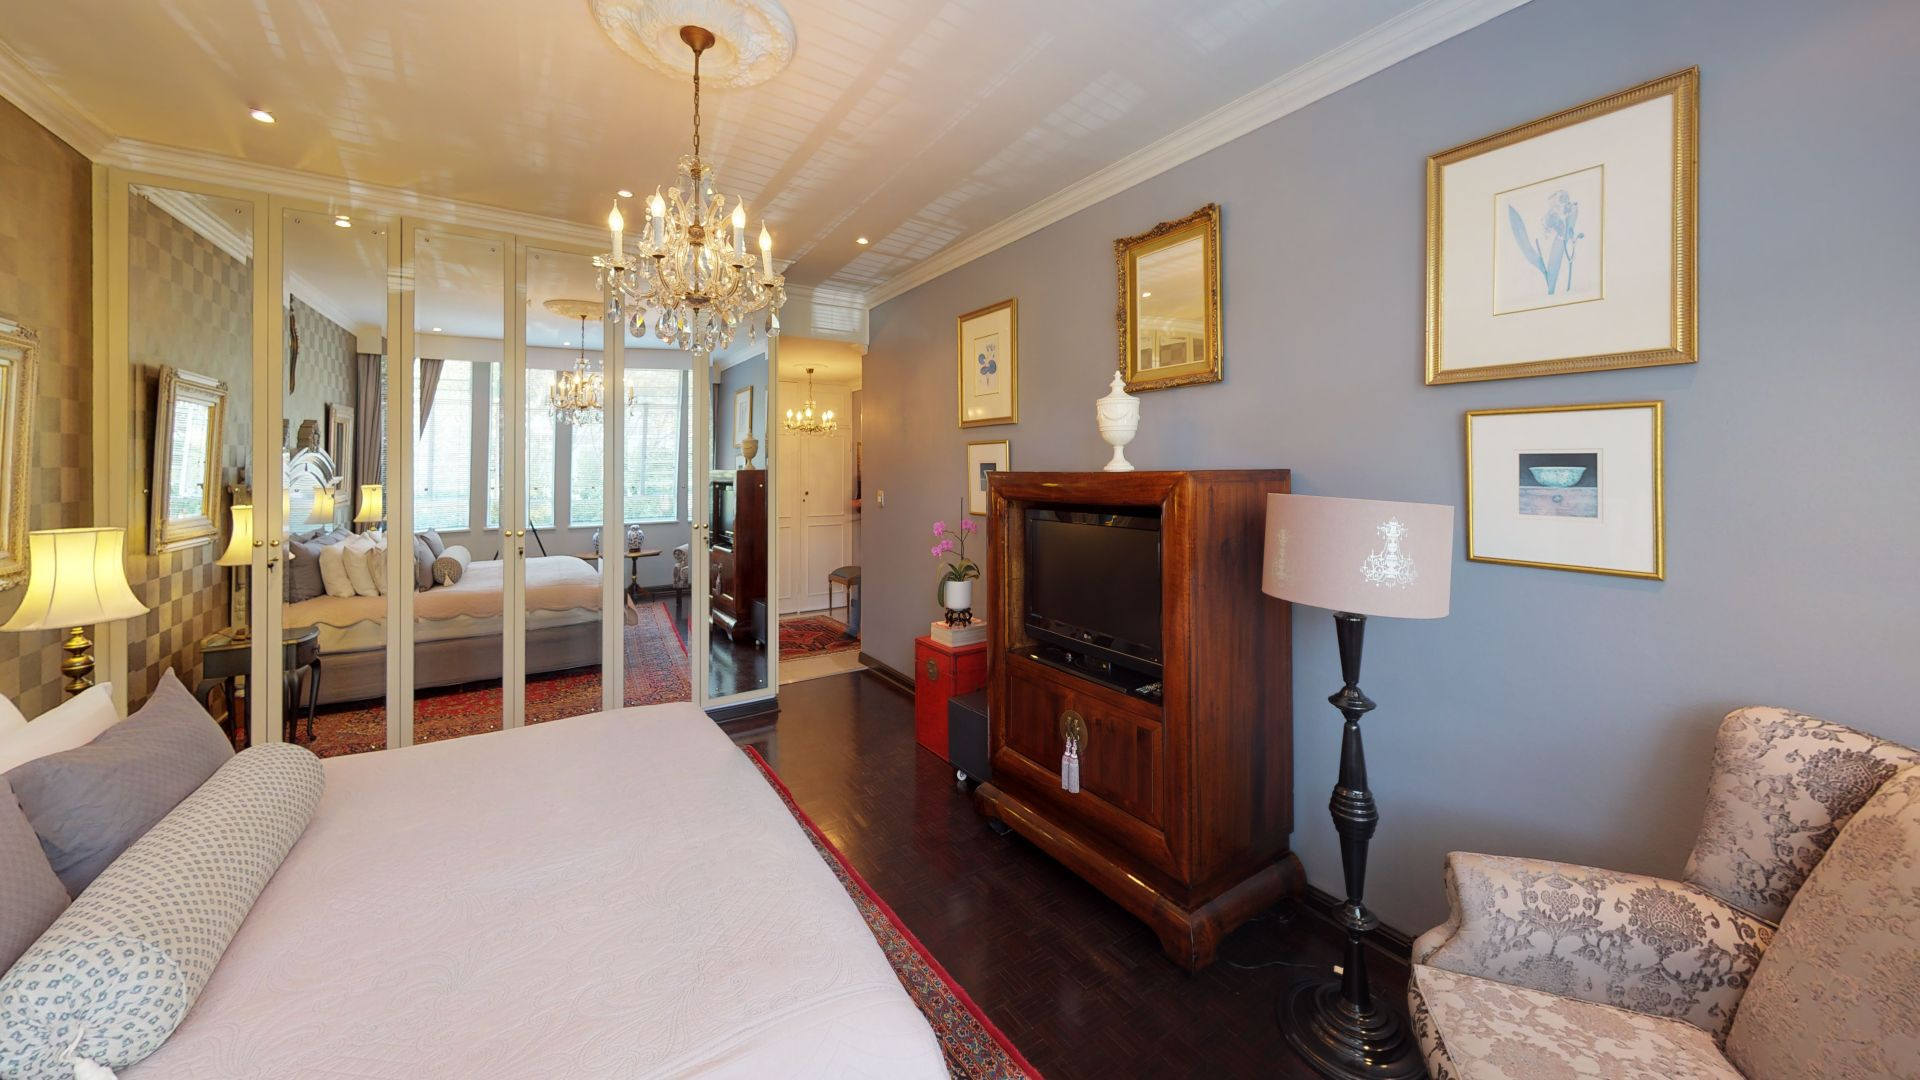 6-Lymington-Mews-Bedroom(1).jpg